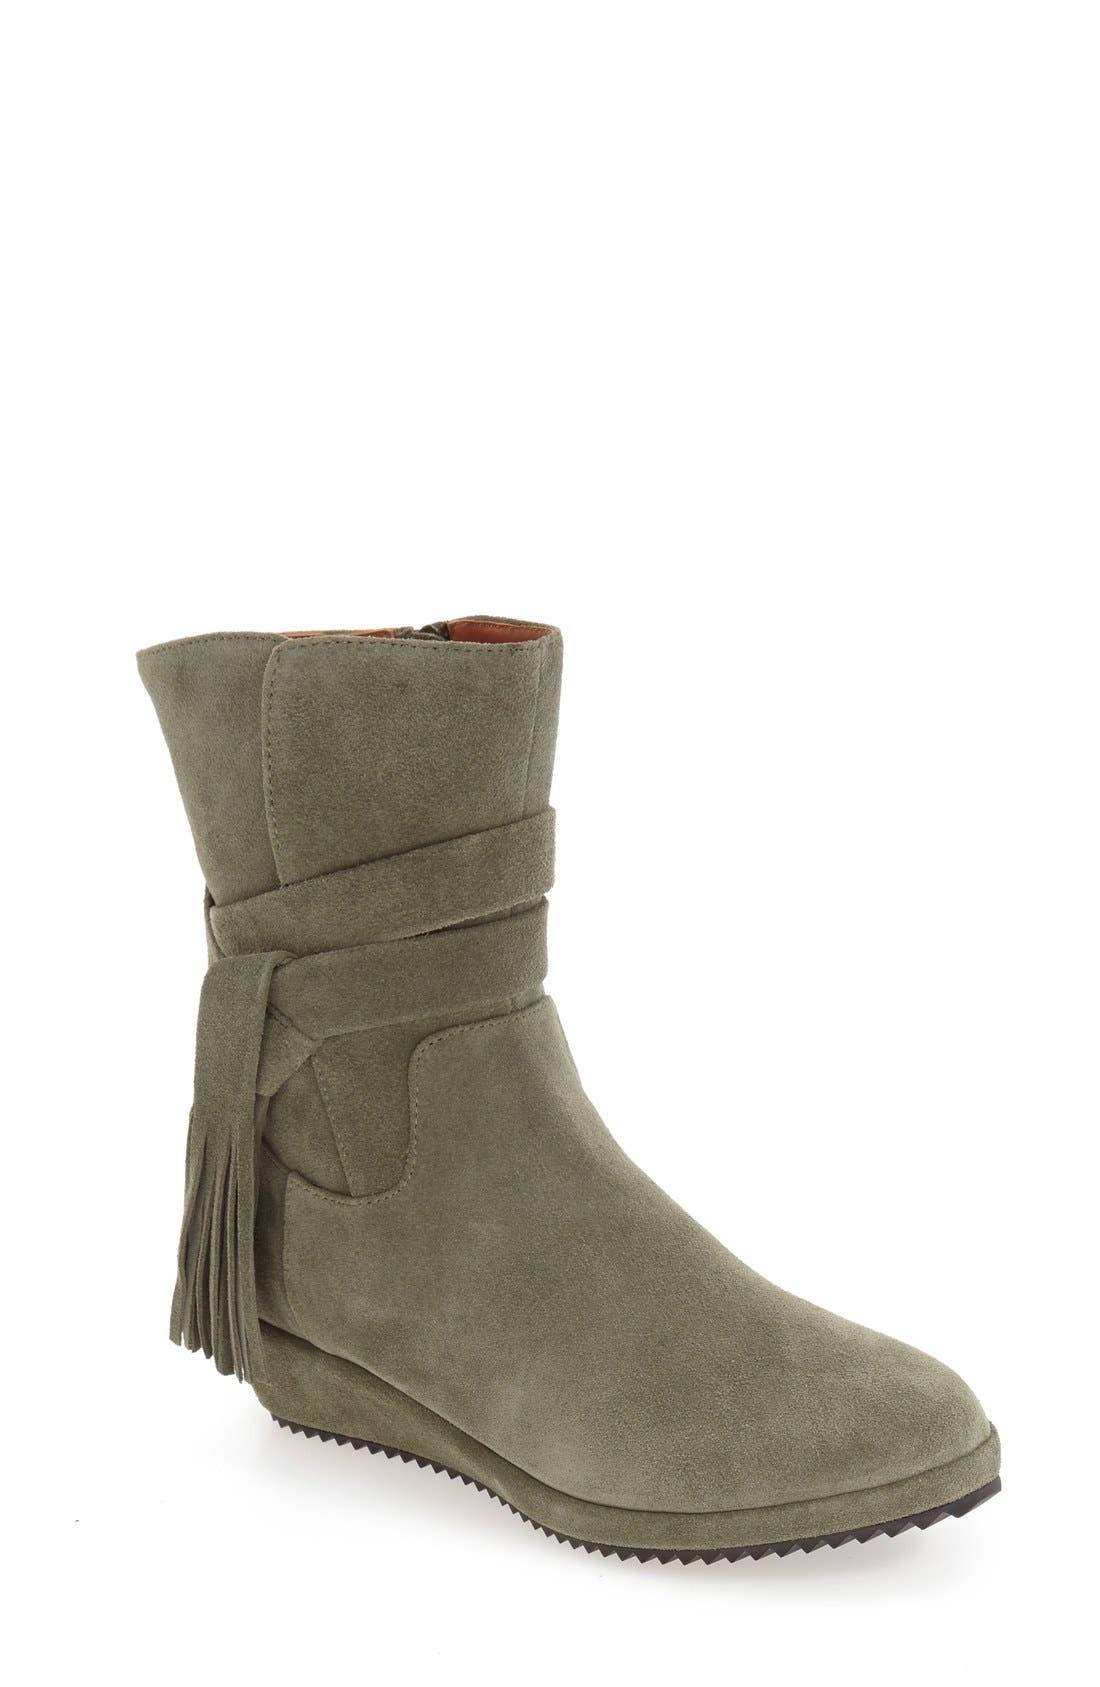 Main Image - L'Amour des Pieds 'Bernyce' Boot (Women)